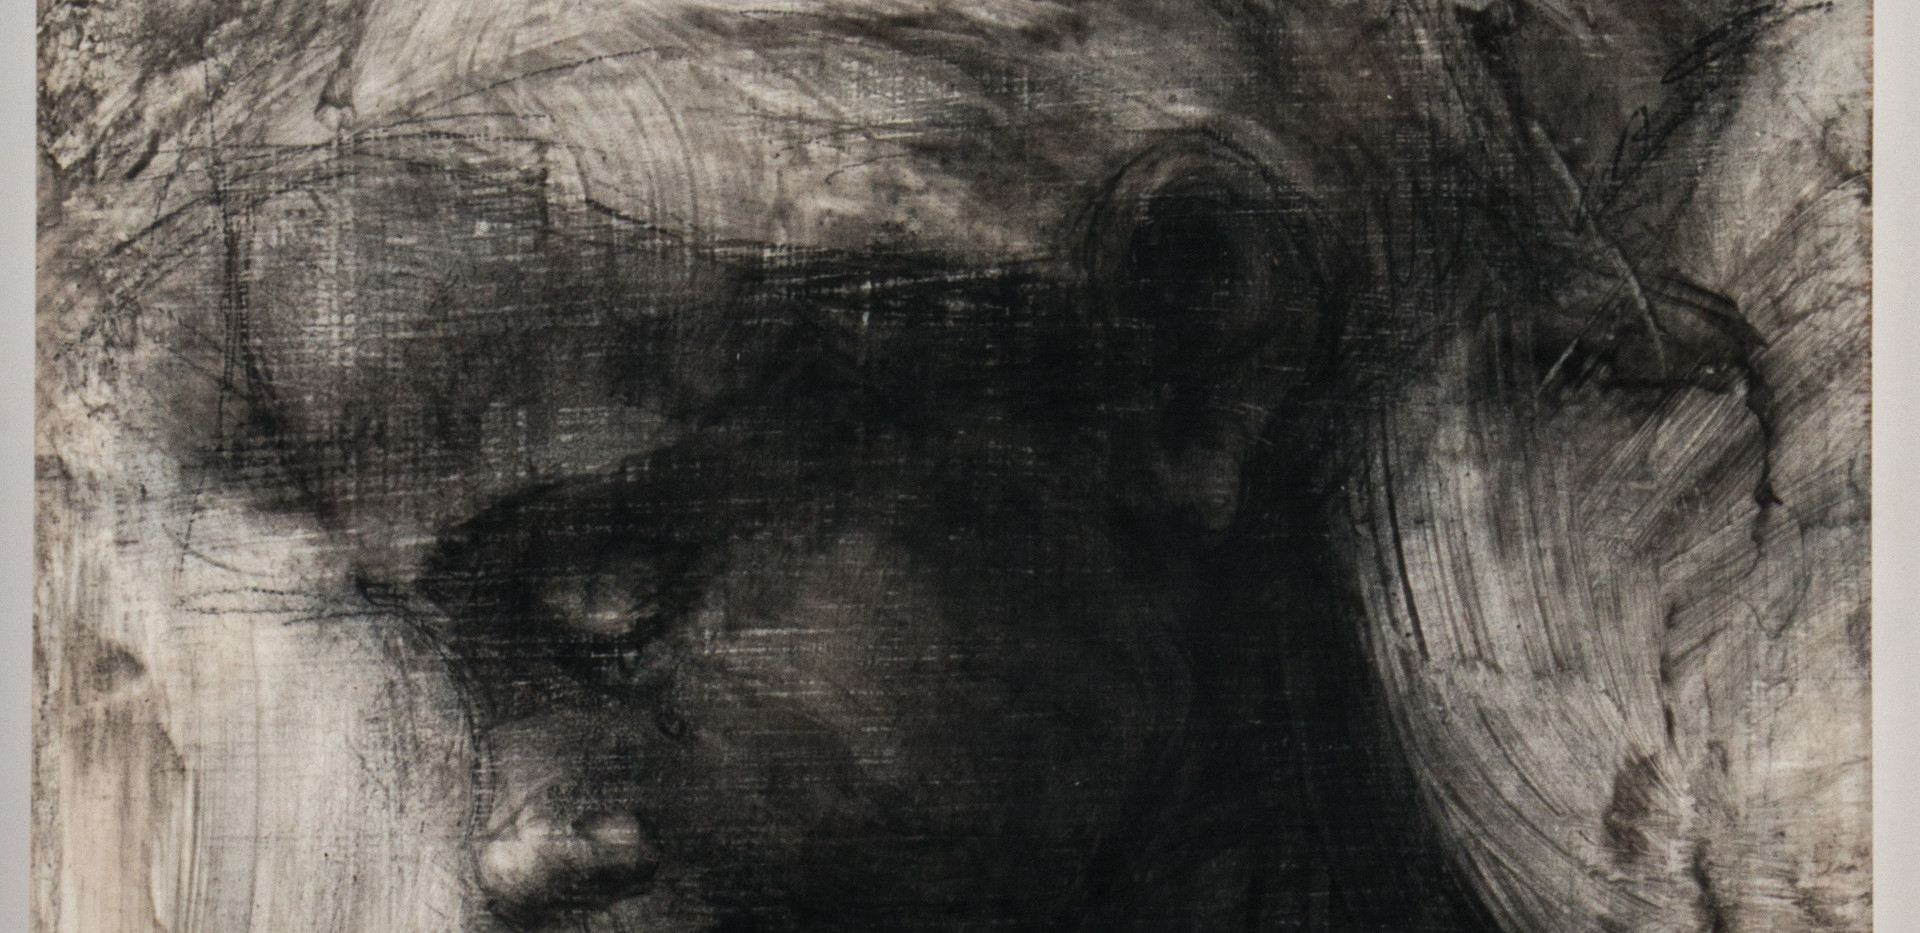 CADA UN , X.  29x21 cm  Carboncillo sobre gesso